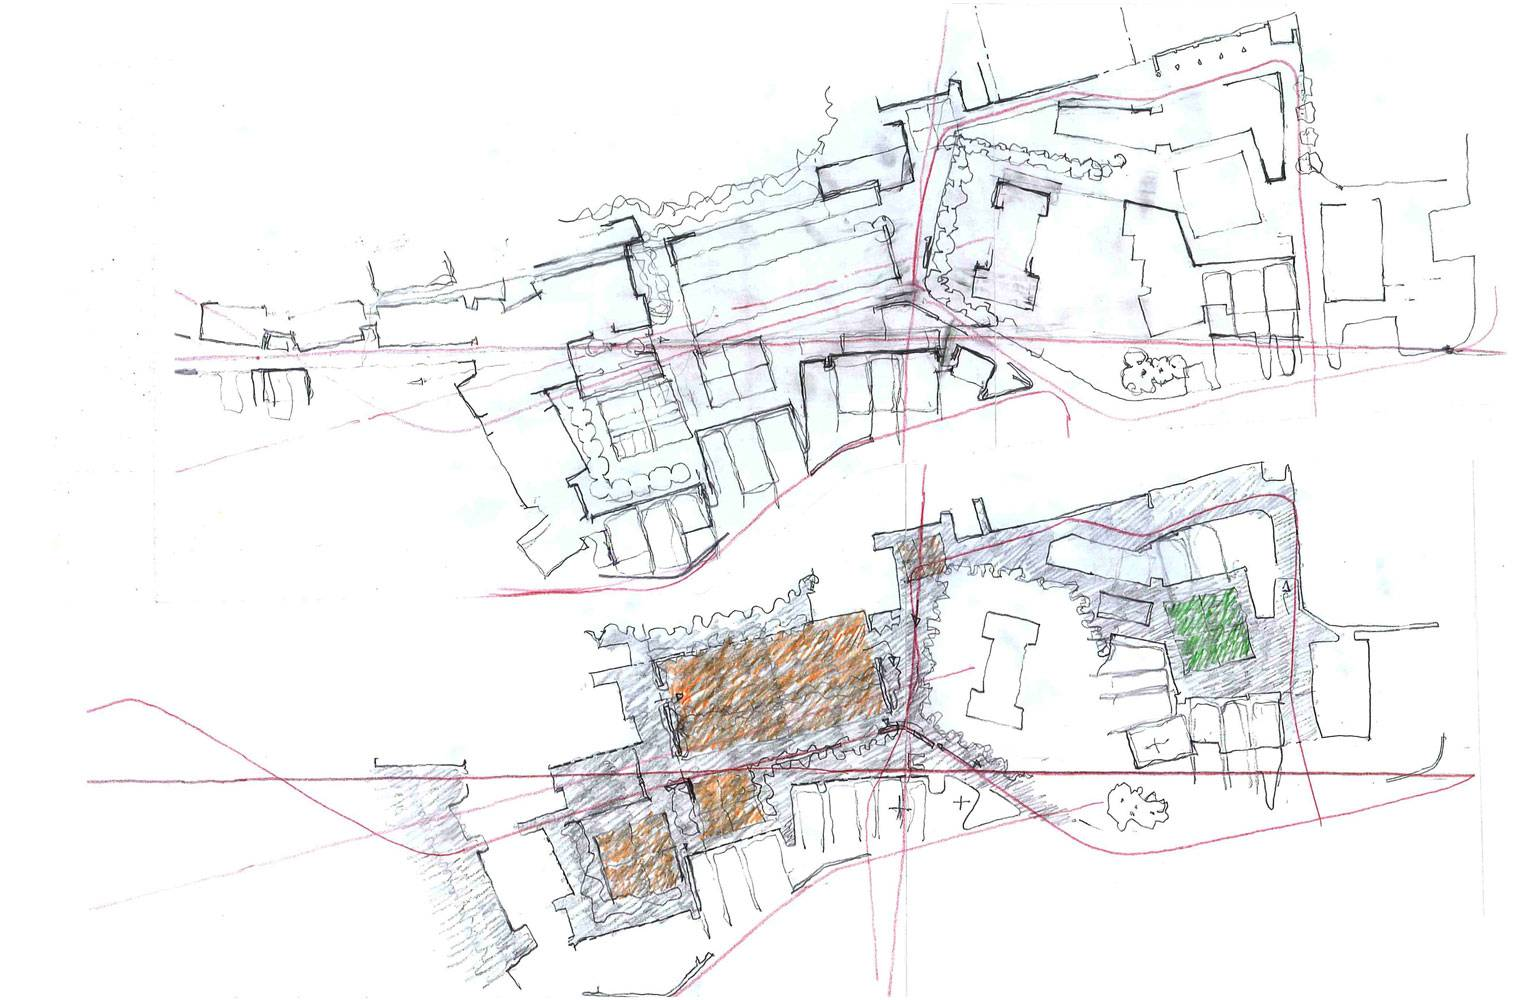 St. Francis Bay - Urban Design Study